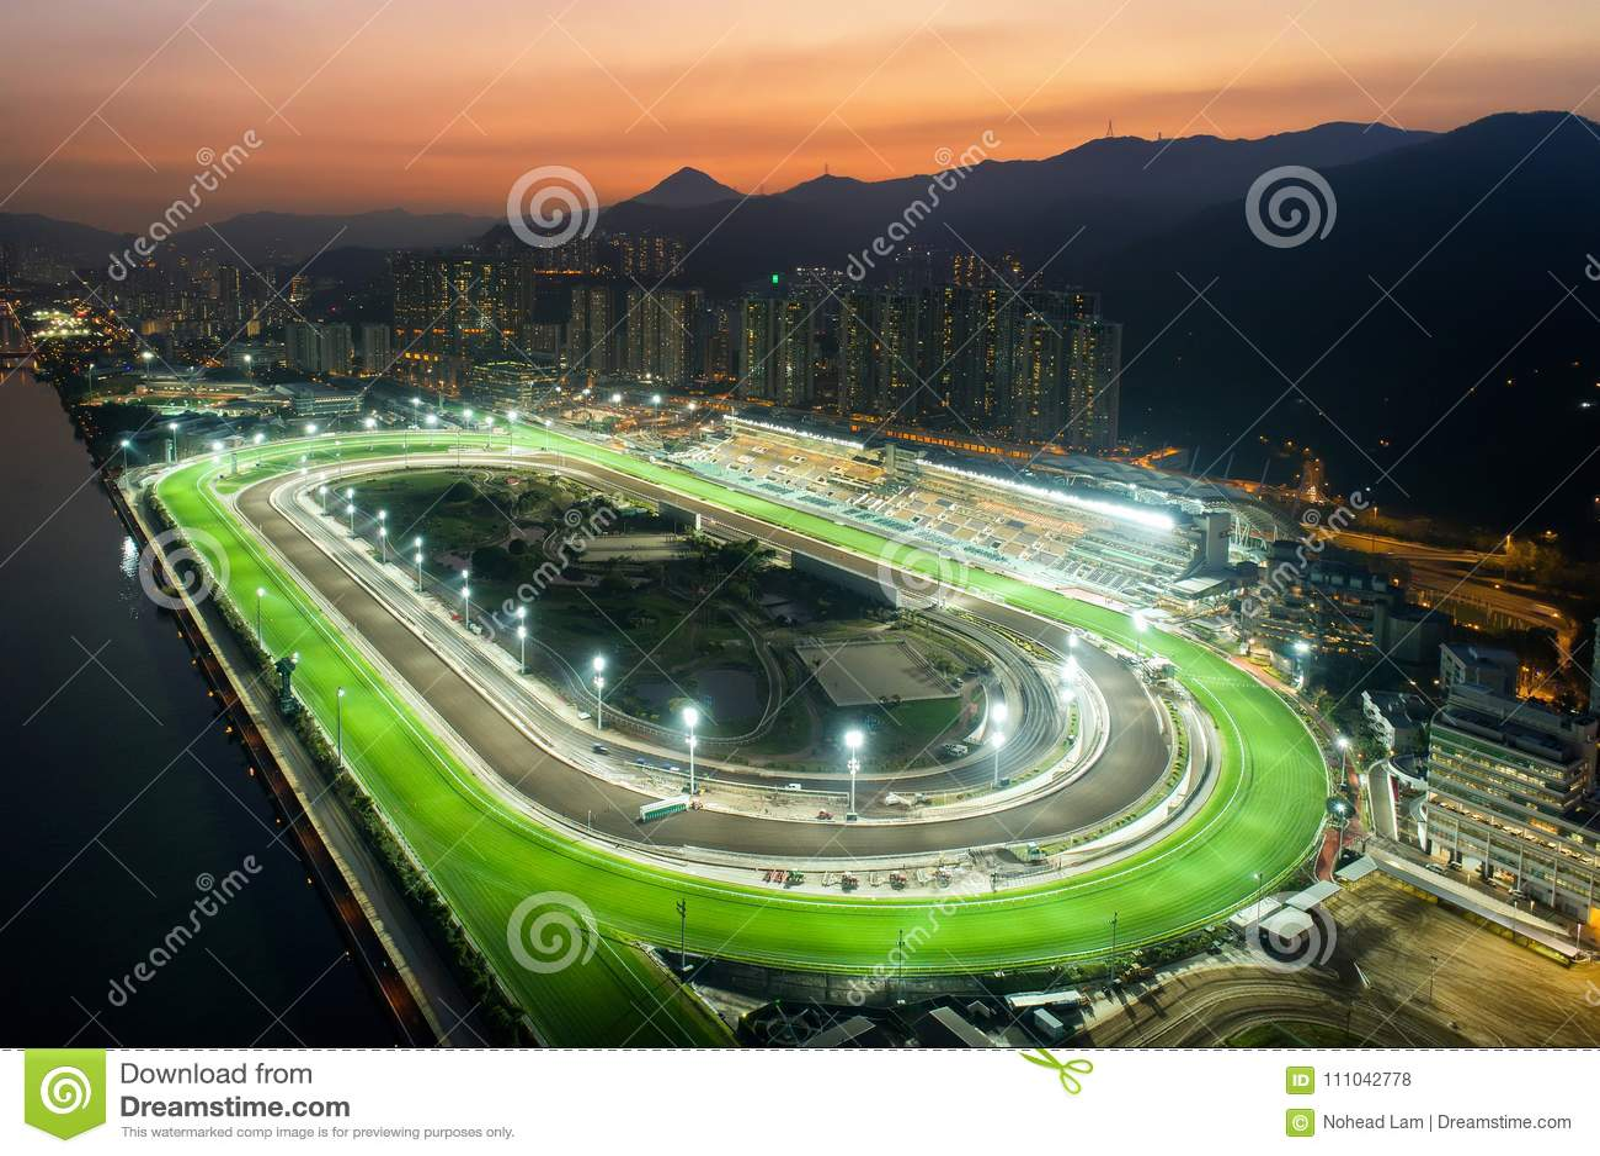 Where Is Sha Tin Racecourse